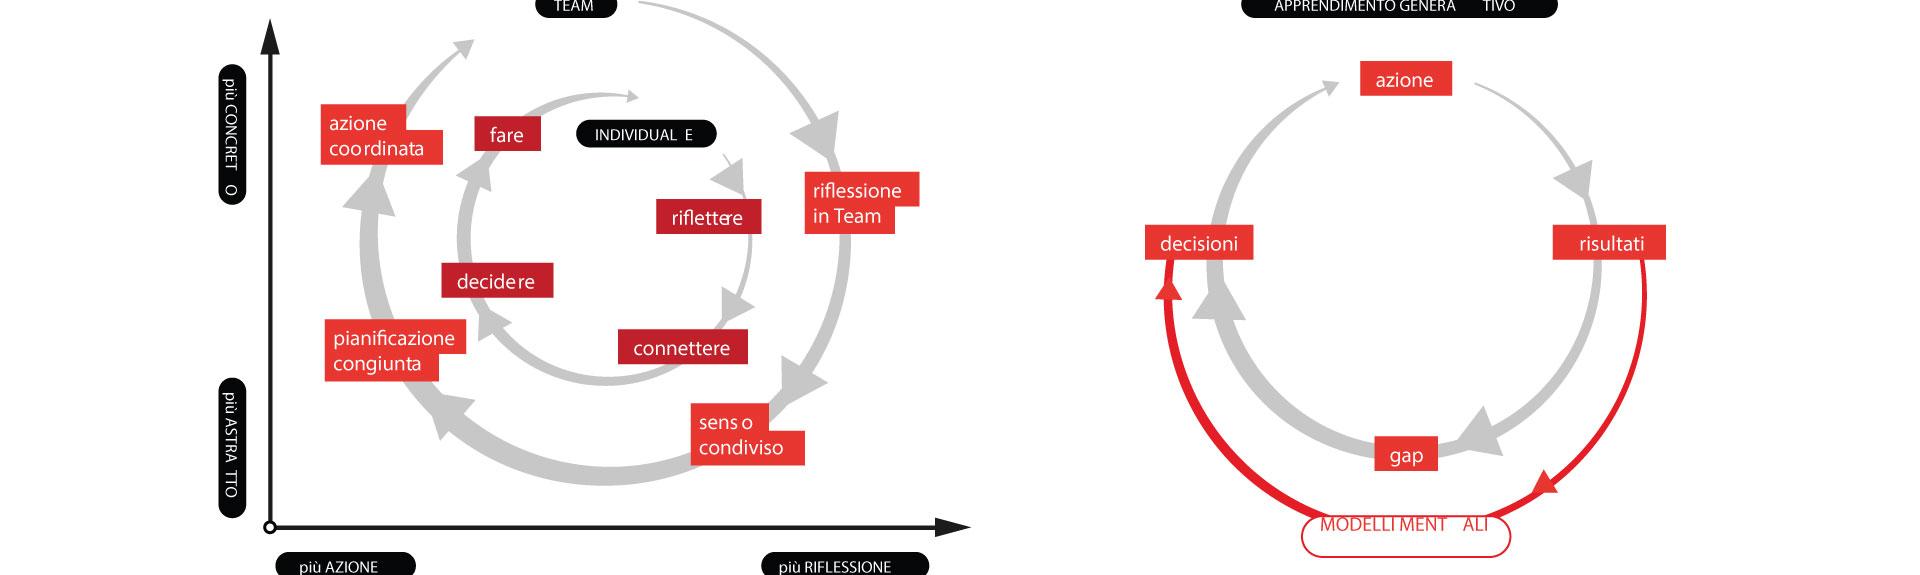 Service Design Tools: Generative Learning Wheel